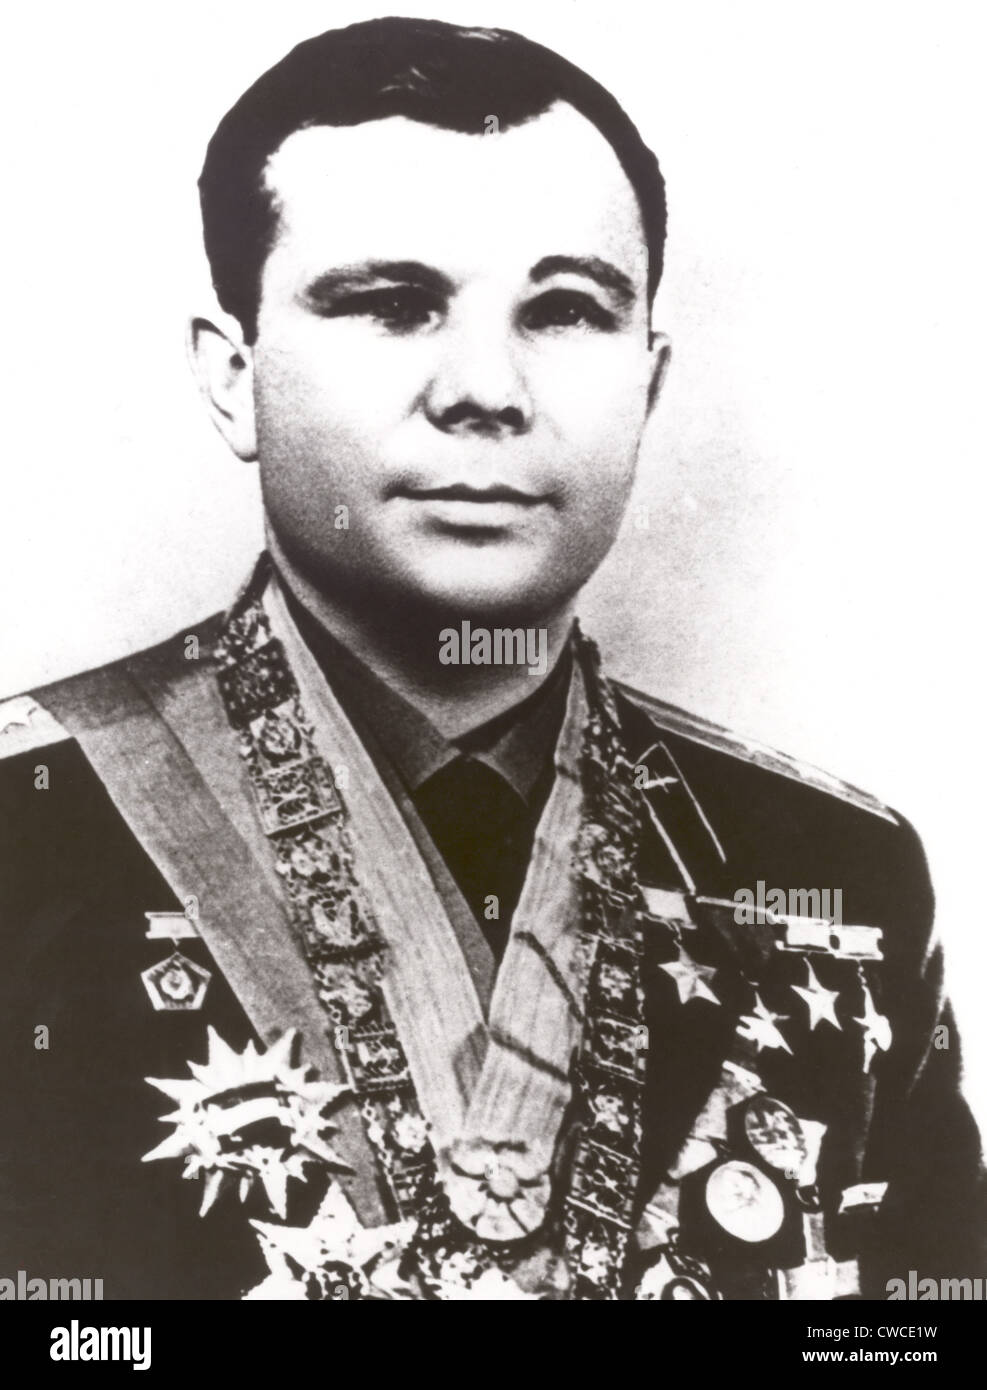 Russian Cosmonaut Yuri Gagarin was the first human in space. Ca. 1961. - Stock Image